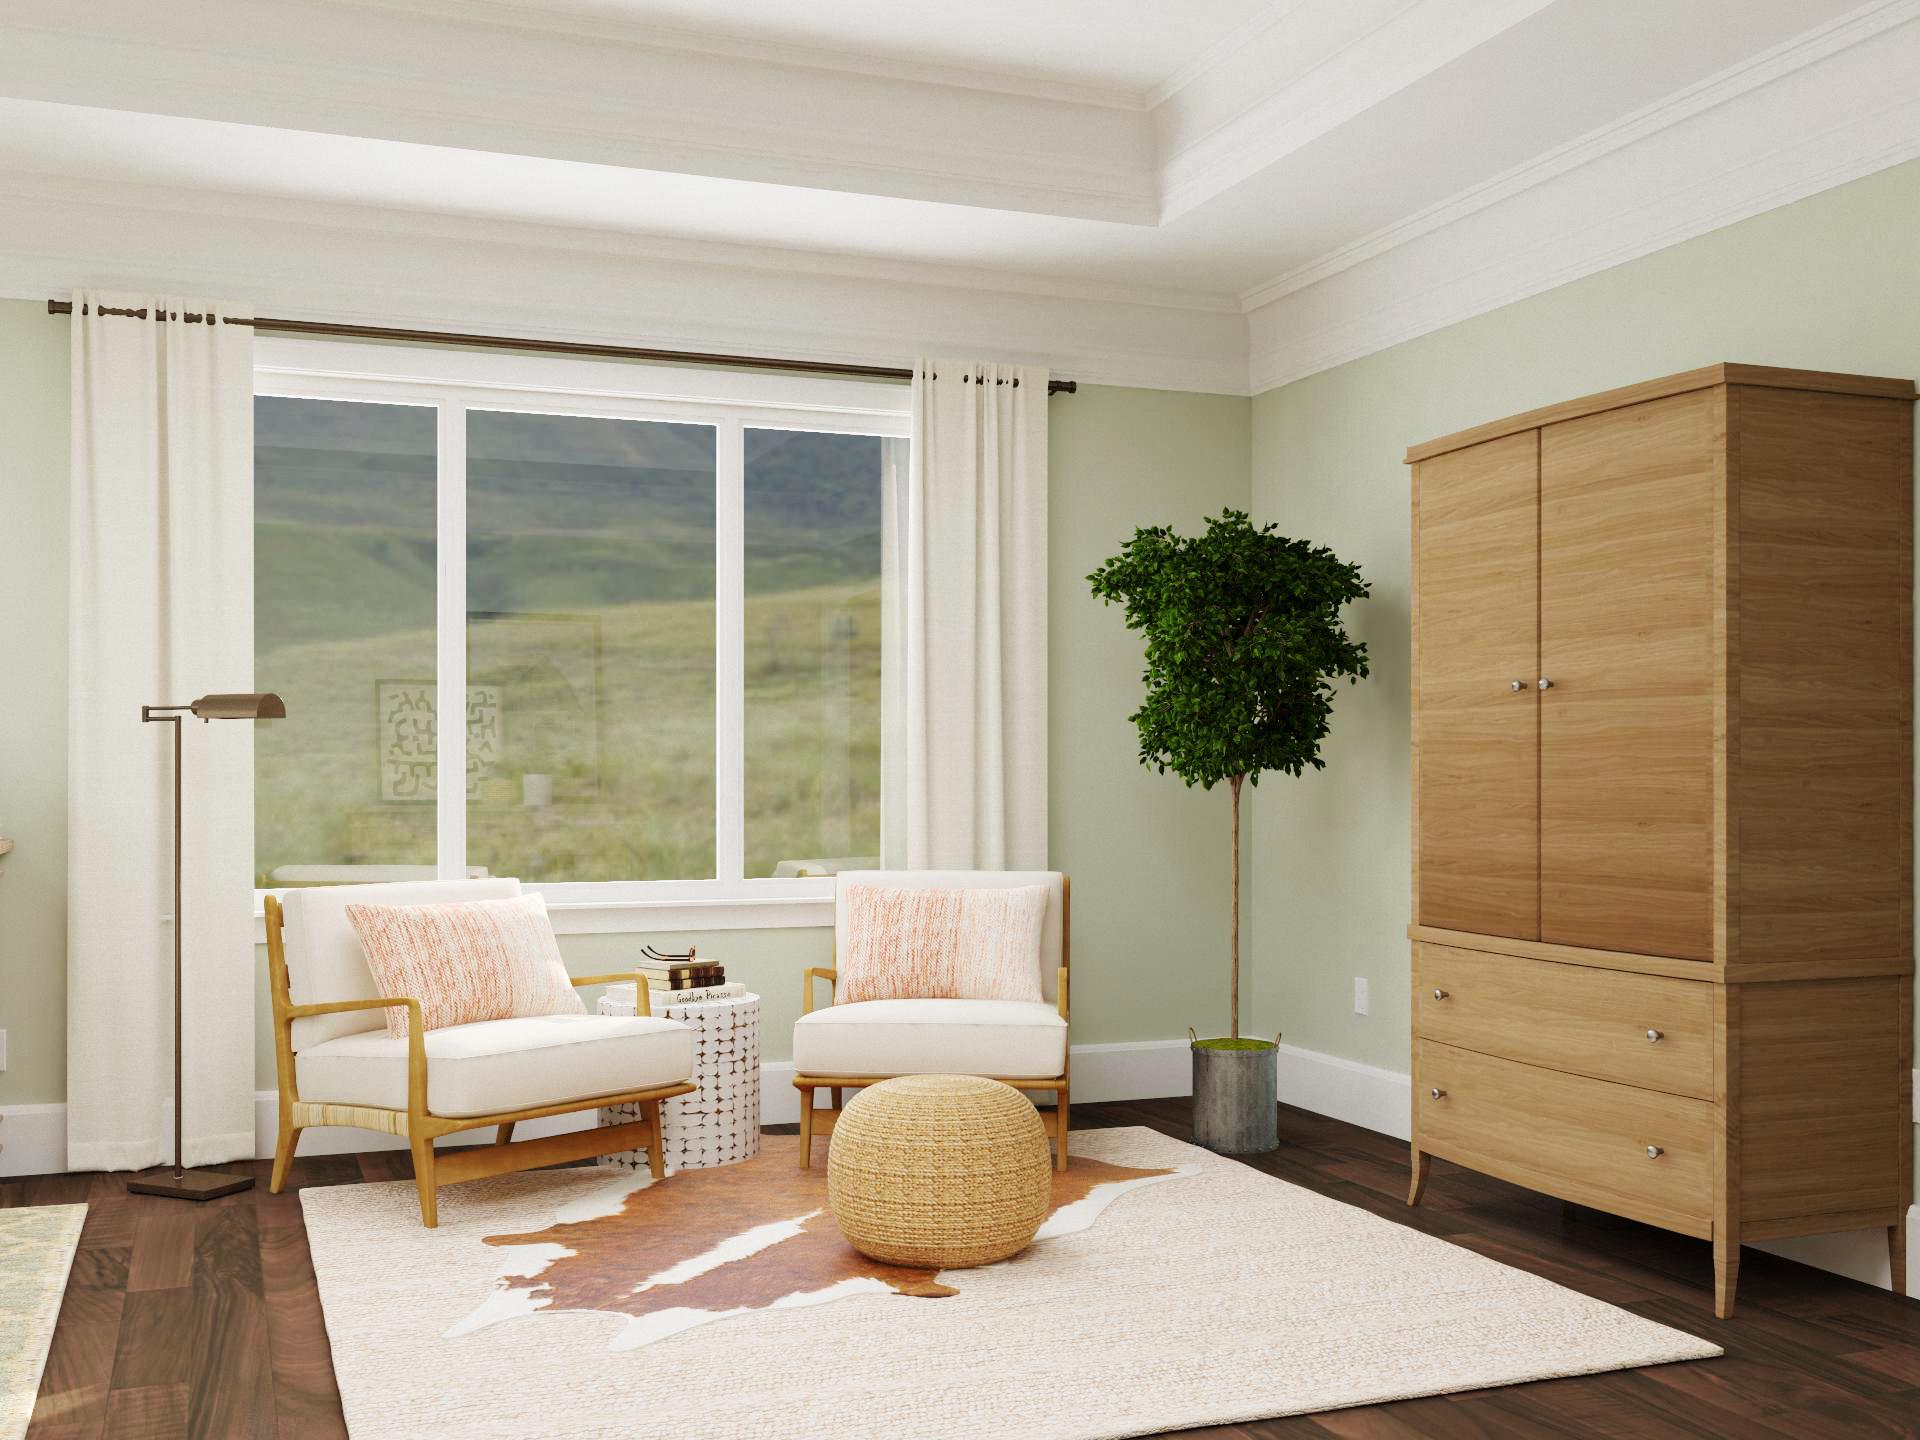 Large Master Bedroom Layout Guide Master bedroom layout